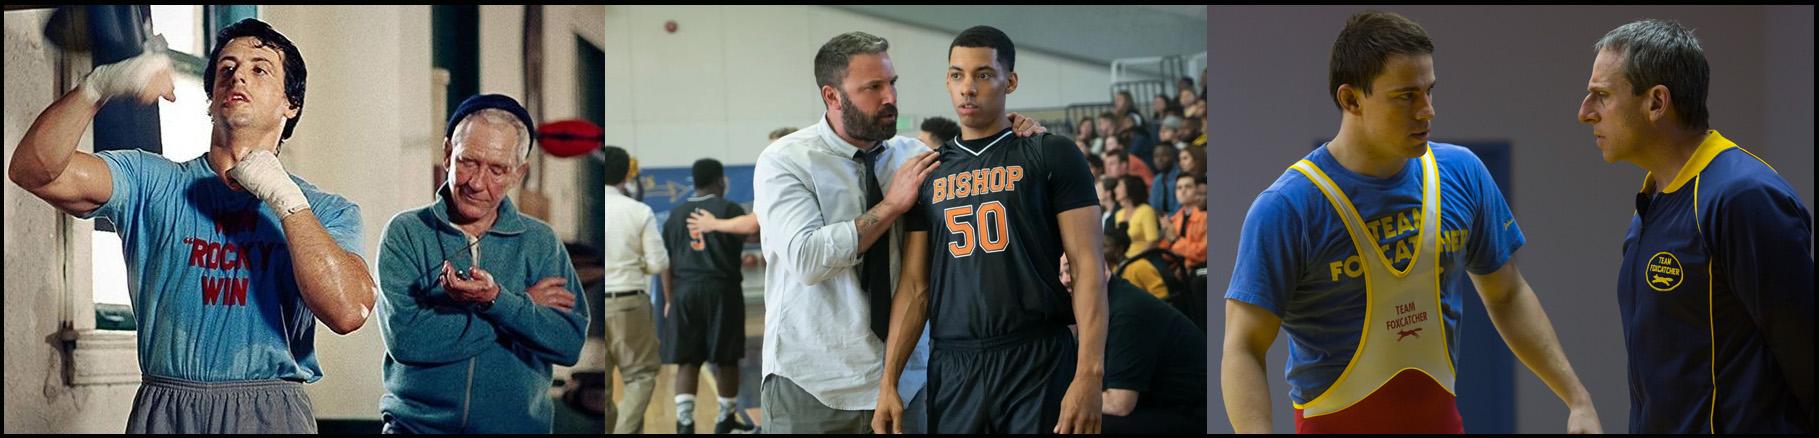 Sportfilm Coach